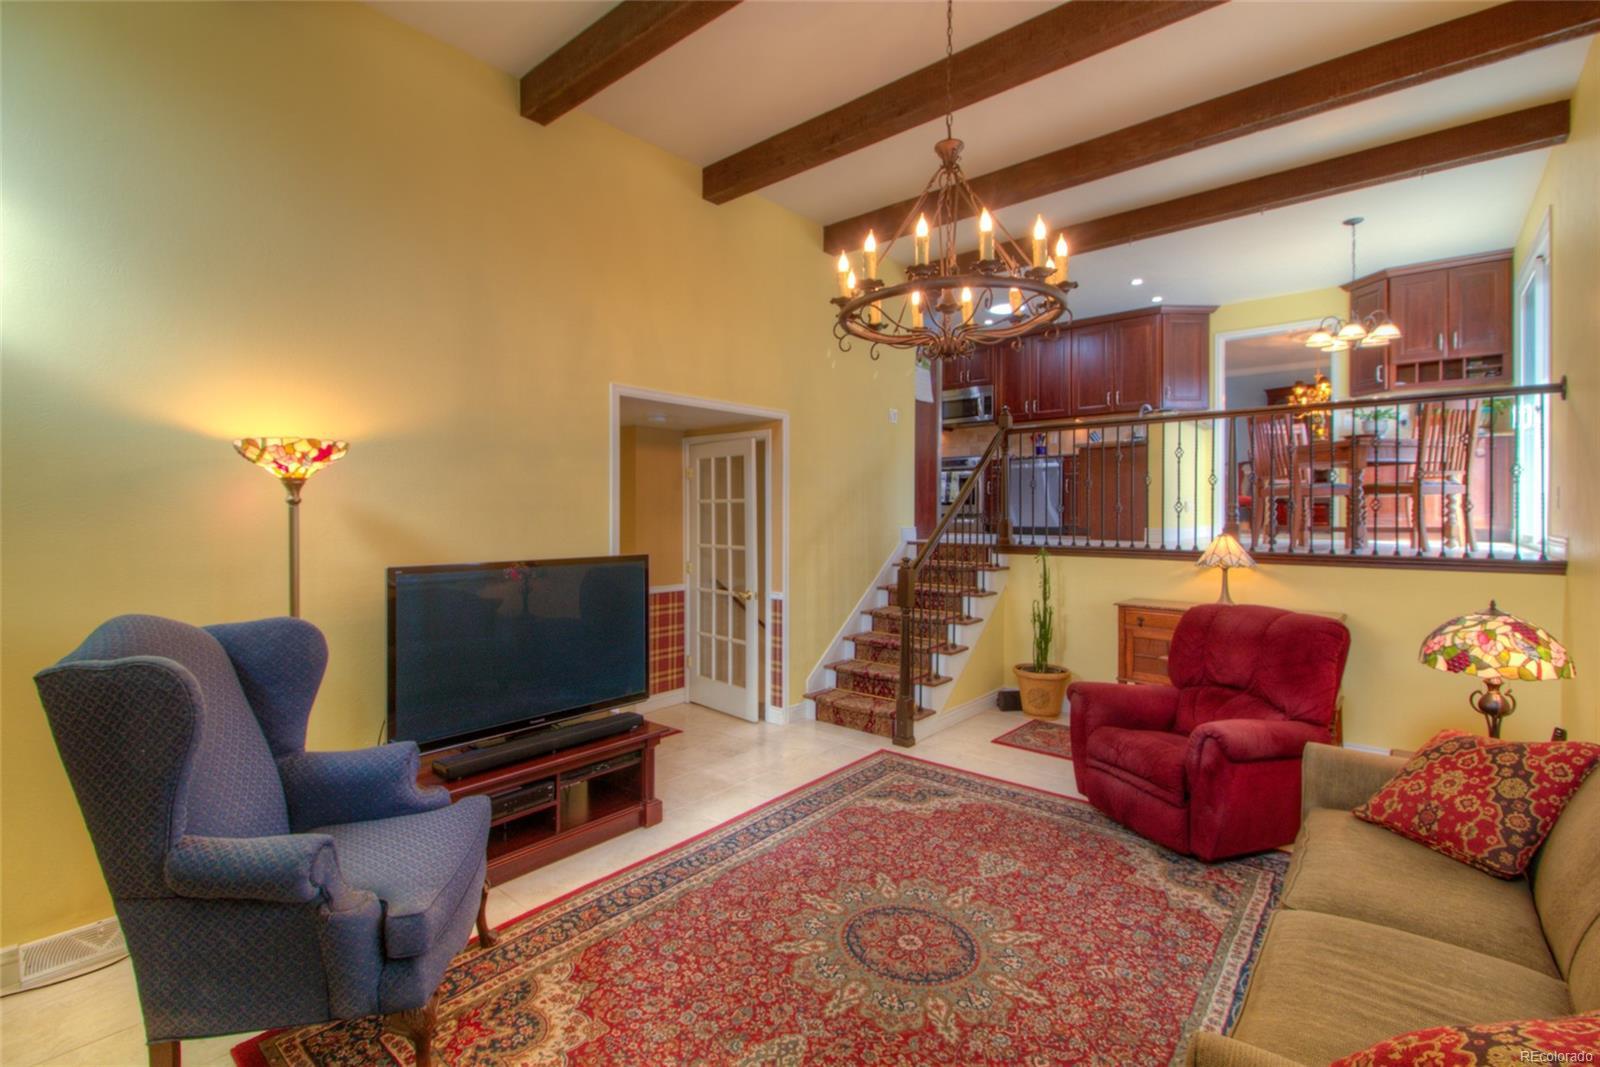 Family Room has tile floors, wood beams and stunning light fixture